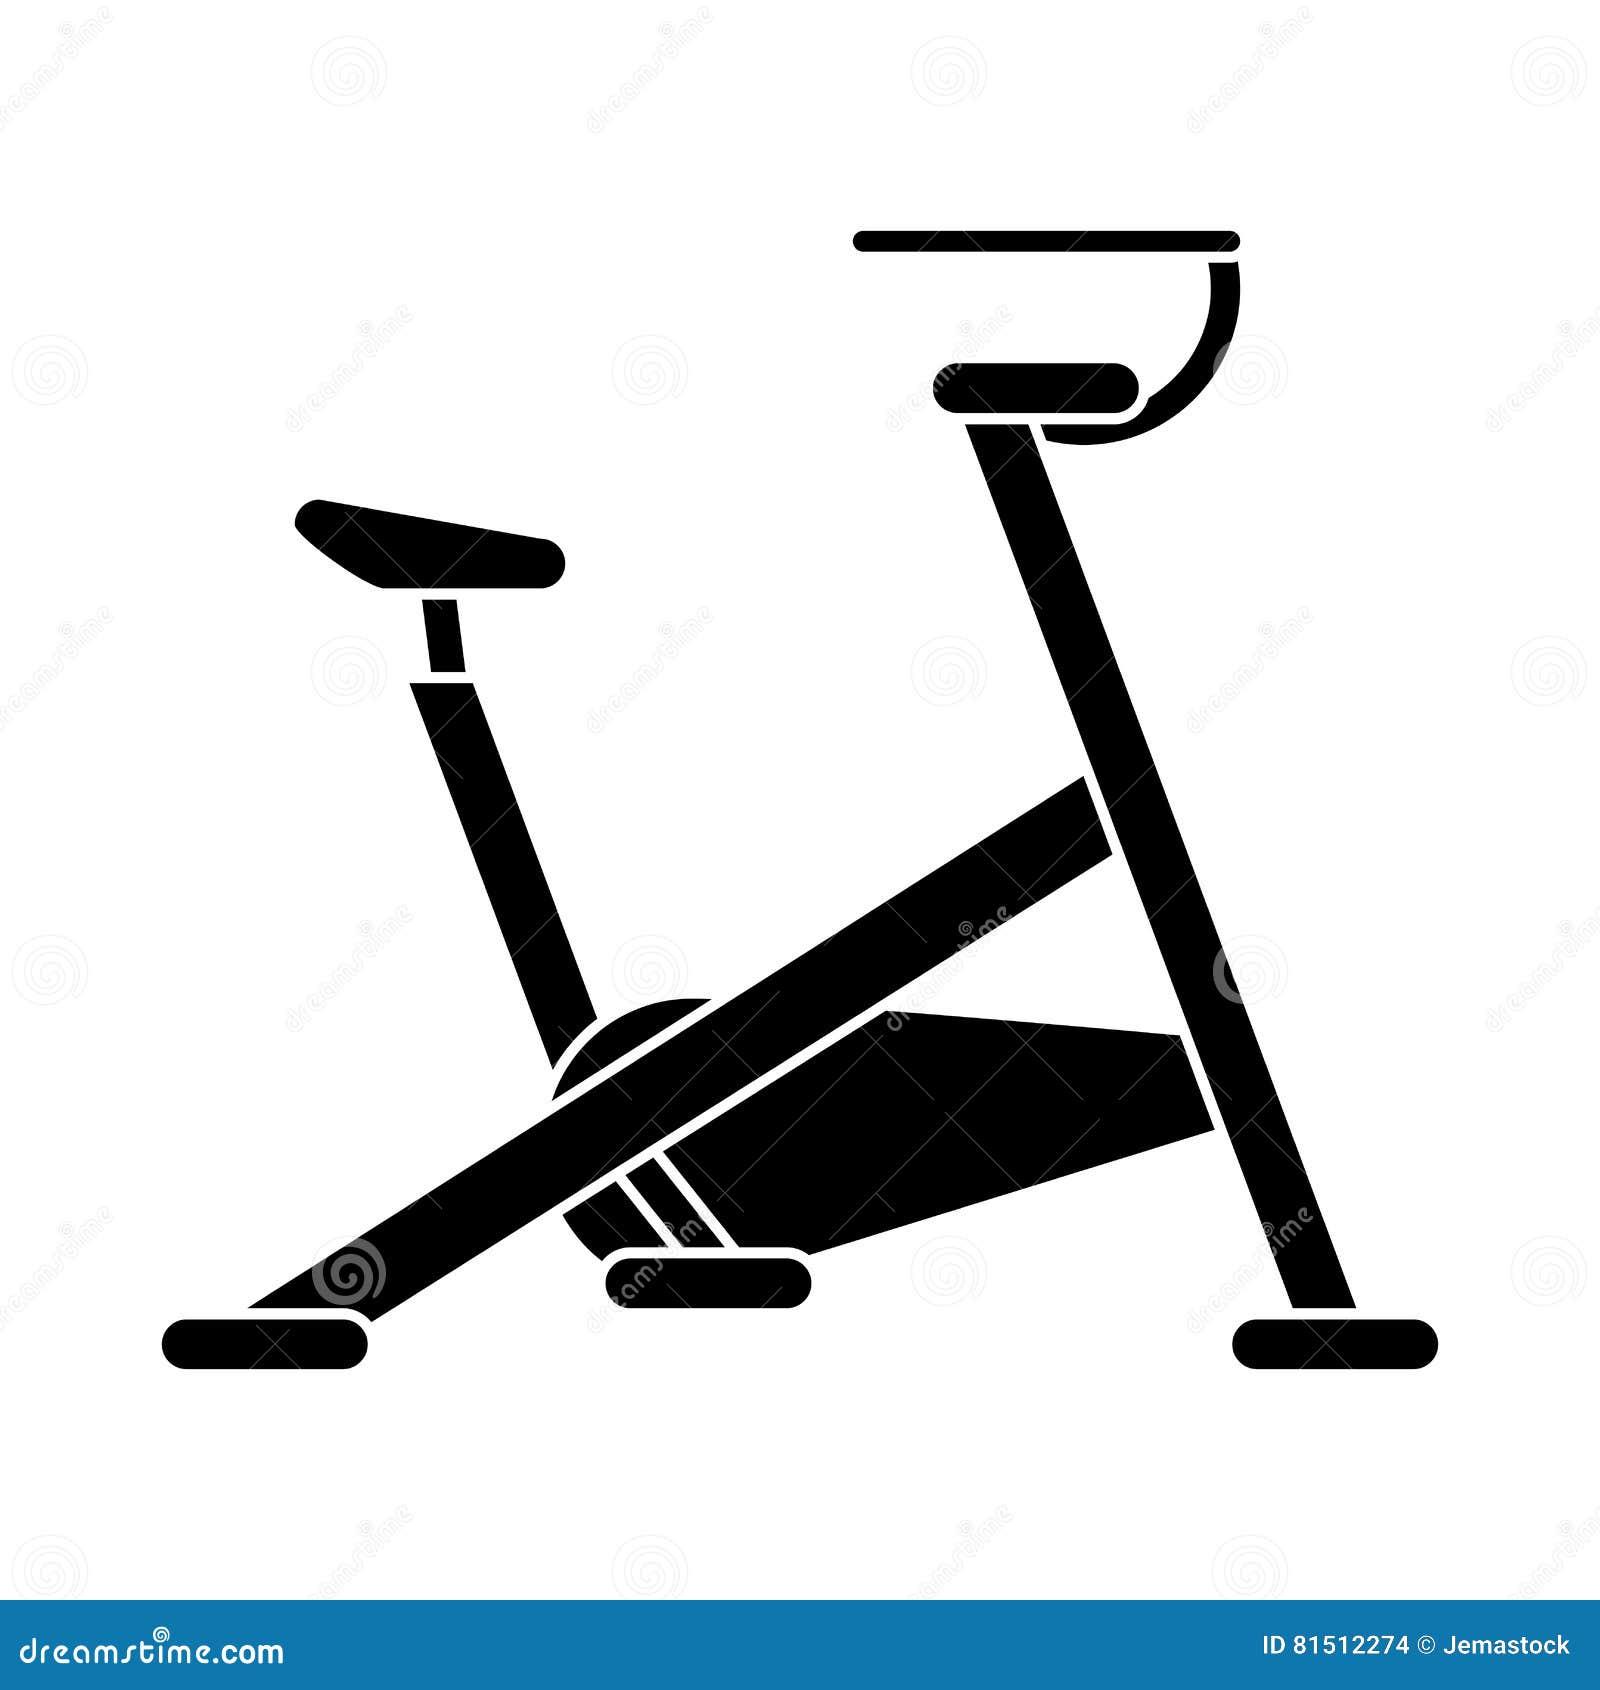 Deporte inmóvil del gimnasio de la máquina de la bicicleta de la silueta